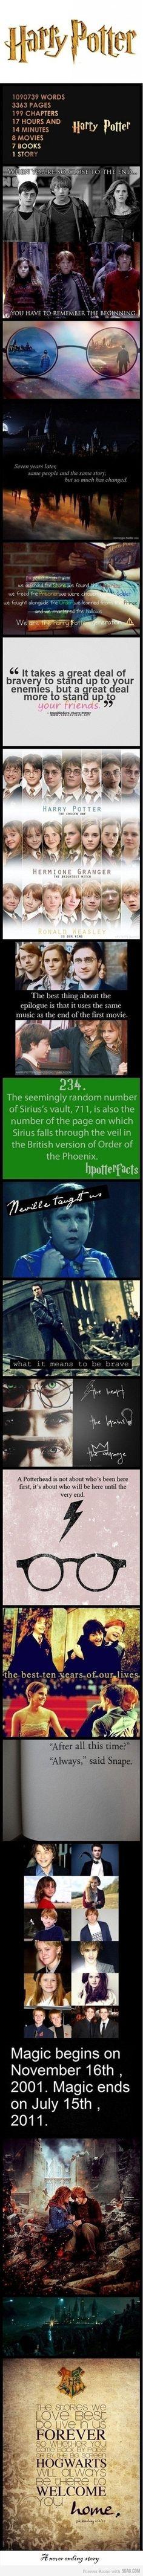 I loved this. Yes, I'm a Harry Potter dork.